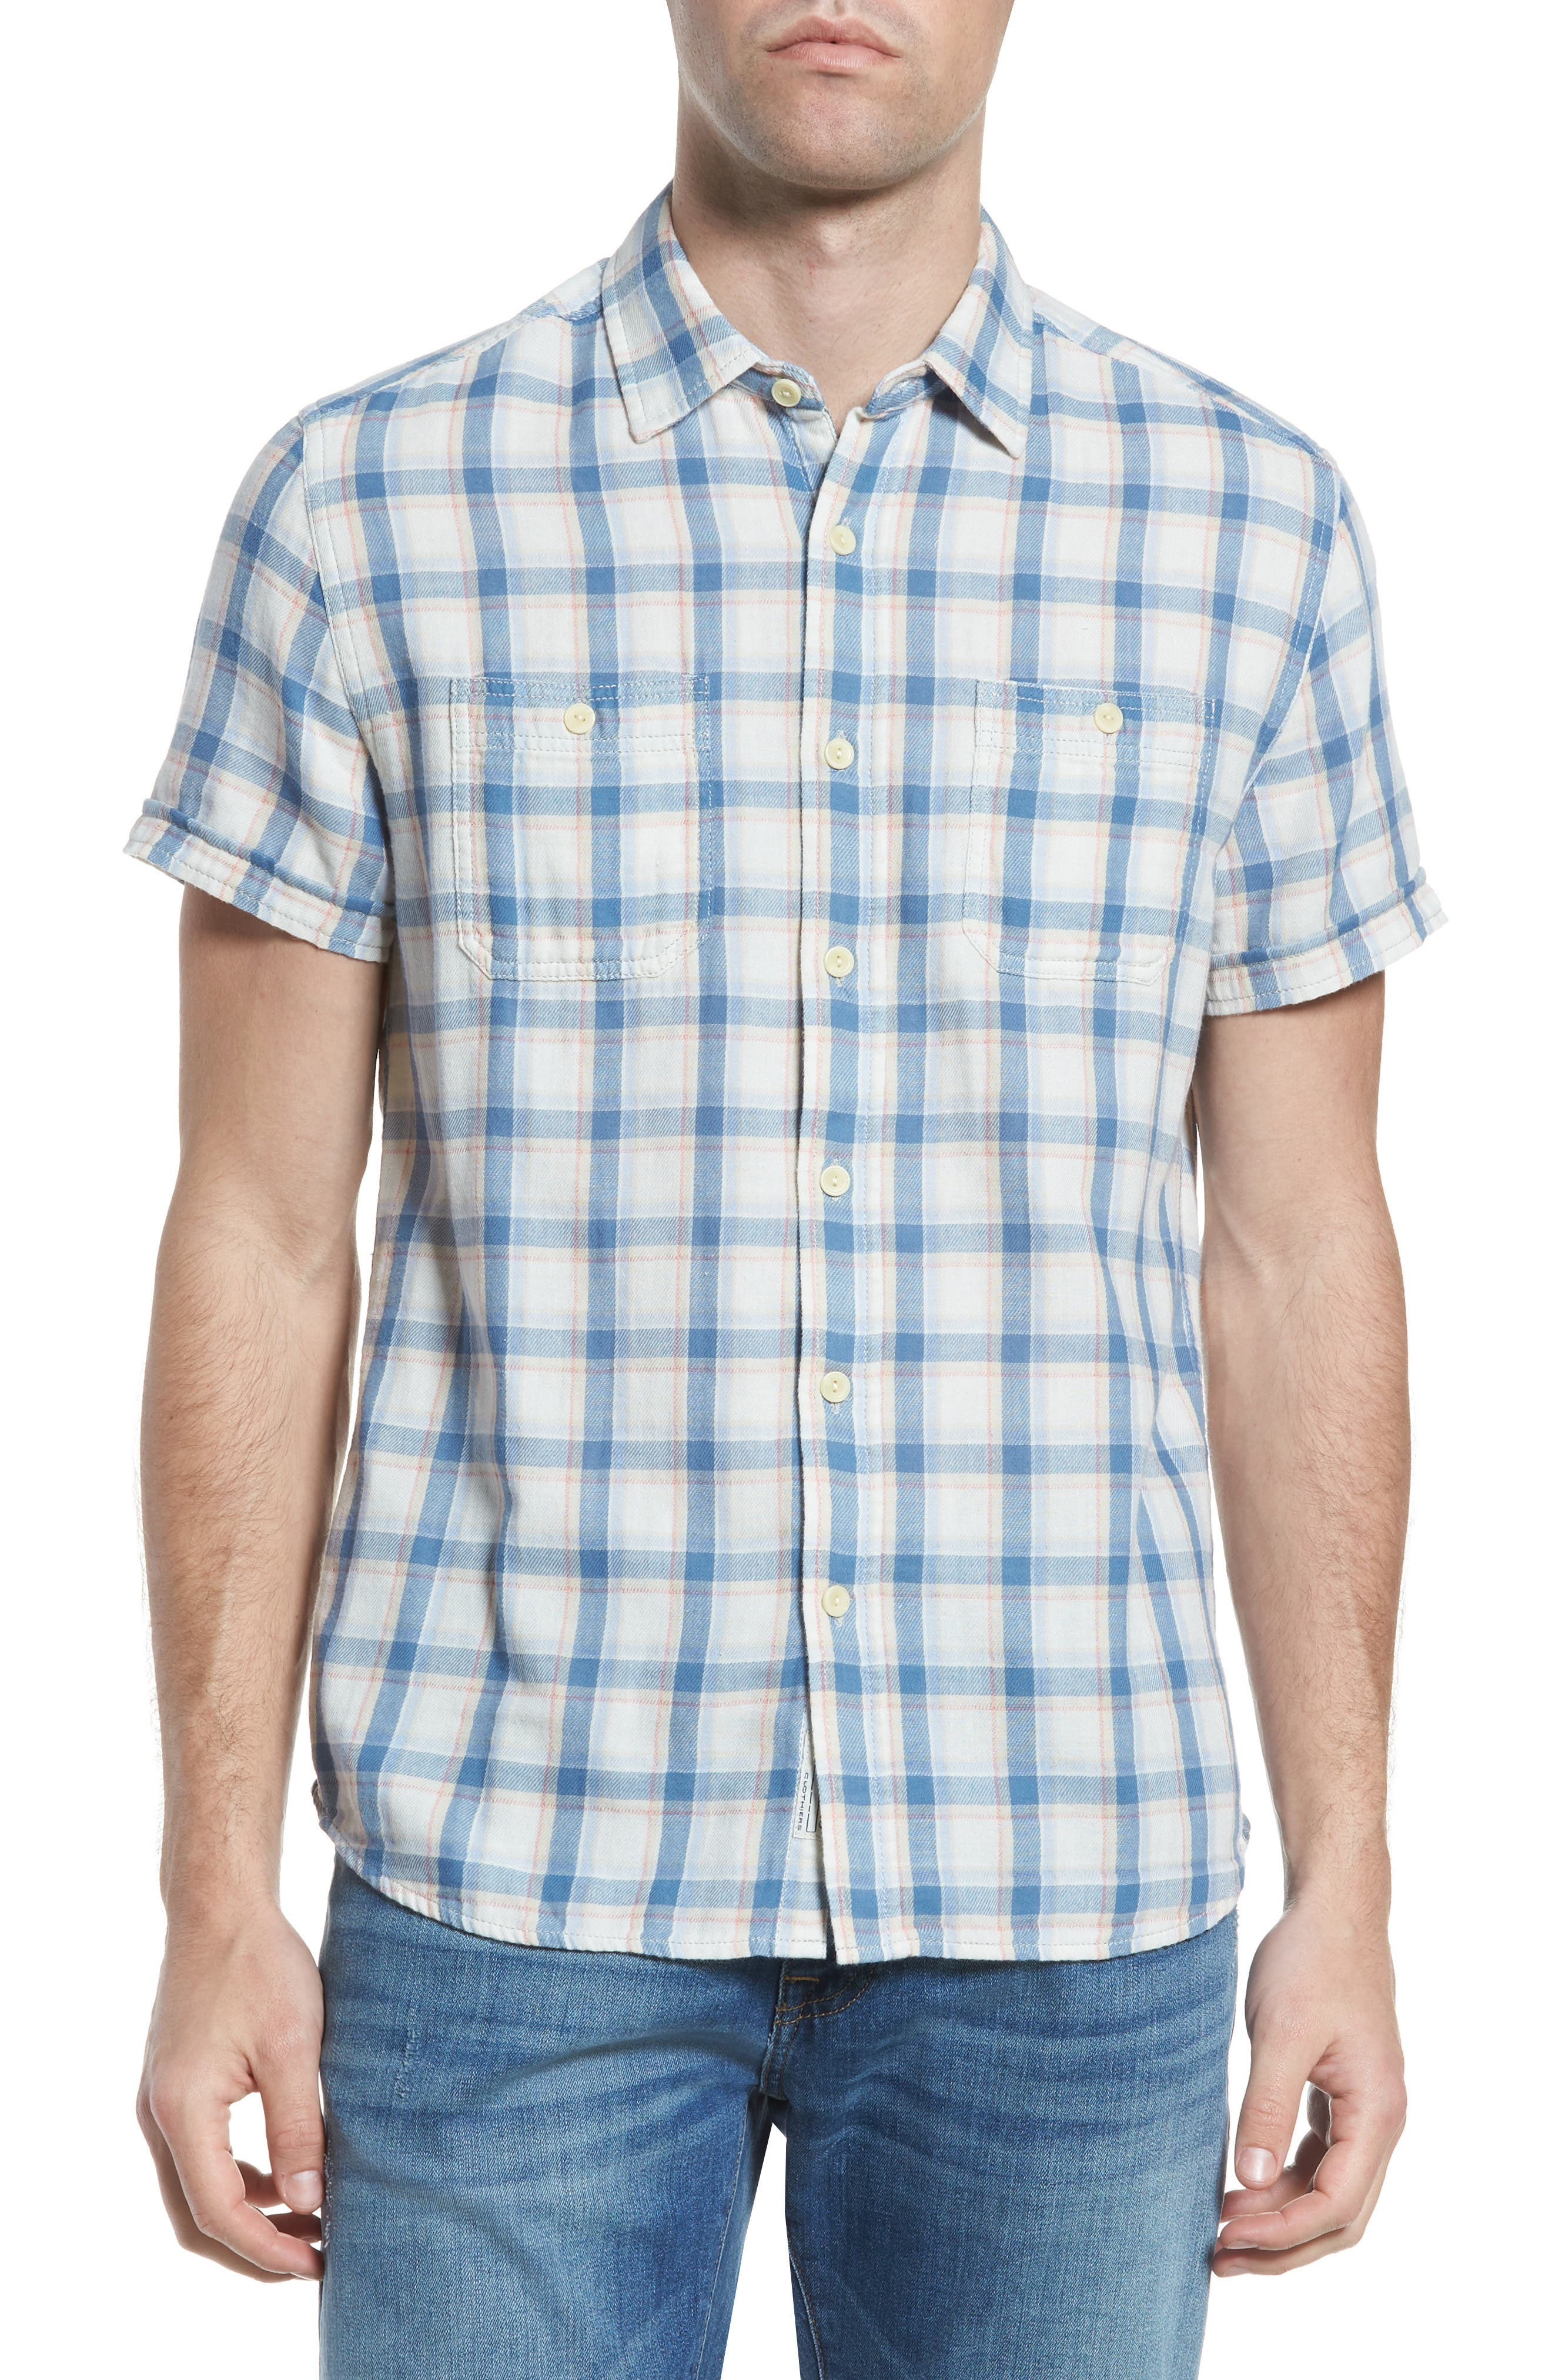 Larson Short Sleeve Sport Shirt,                         Main,                         color, Cream Blue Plaid